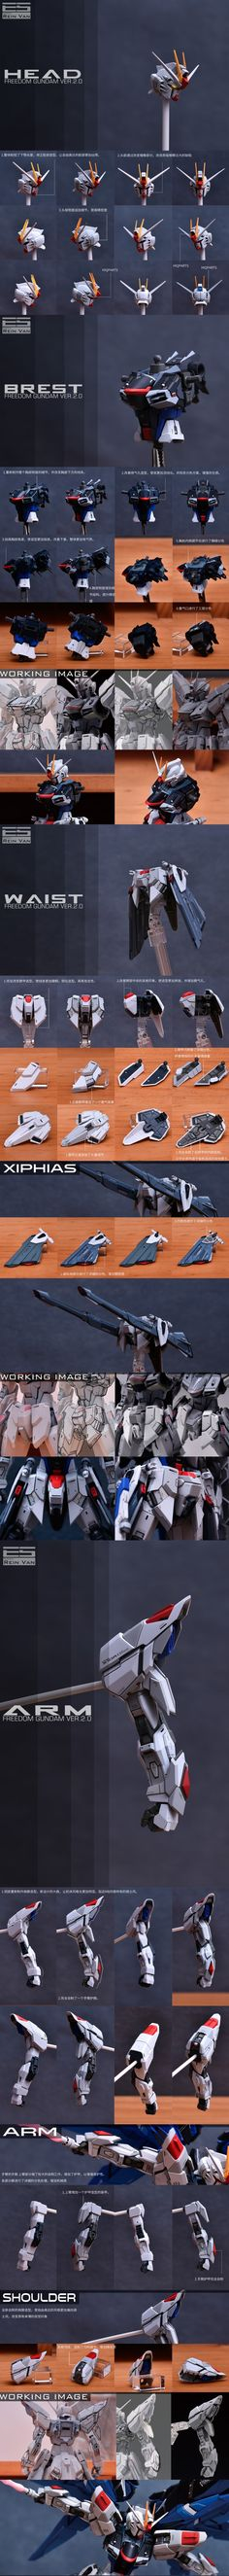 [Infinite_Dimension] 1:100 프리덤 2.0 컨버전킷(레진), 공식 도색 작례 공개! : 네이버 블로그 Plastic Model Kits, Plastic Models, Gundam Head, Gundam Tutorial, Gundam Custom Build, Fantasy Concept Art, Gunpla Custom, Mecha Anime, Robot Design